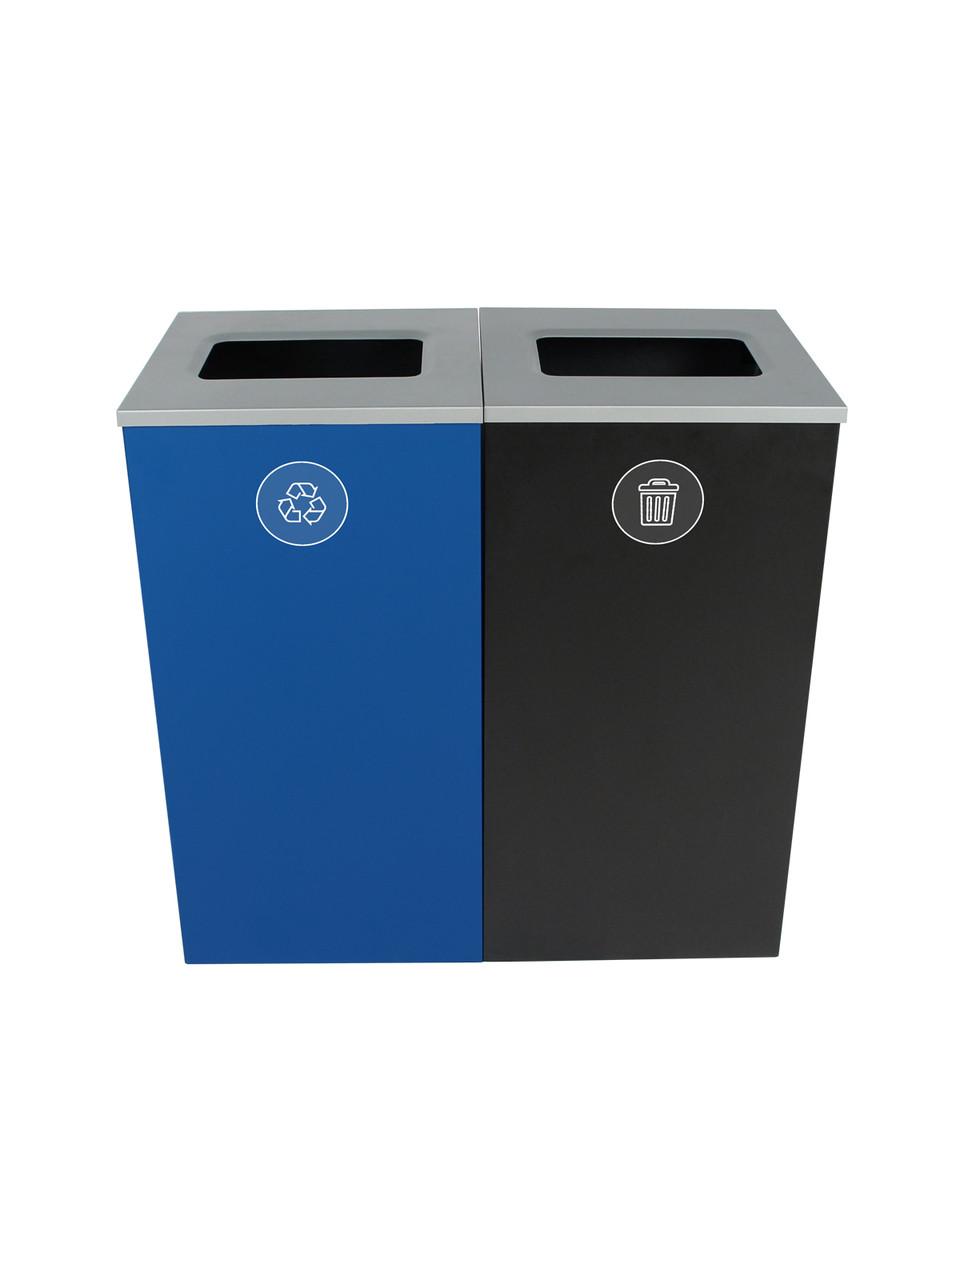 48 Gallon Spectrum Cube Dual Trash Can & Recycle Bin Blue/Black 8107092-44